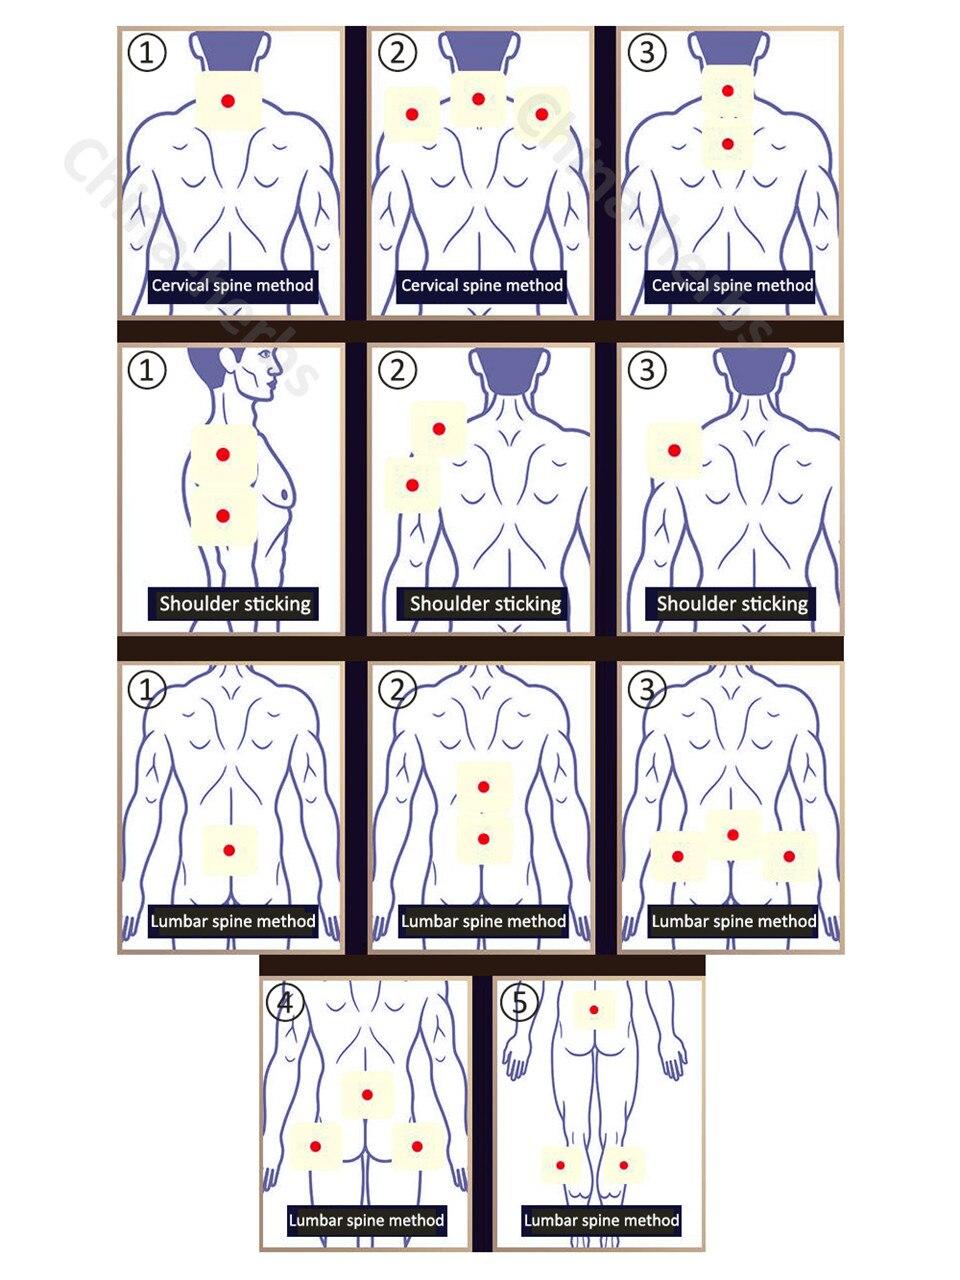 25pcs / lot Band De Li ZB Pain Relief Patch Plasters Gypsum analgesik - Penjagaan kesihatan - Foto 4